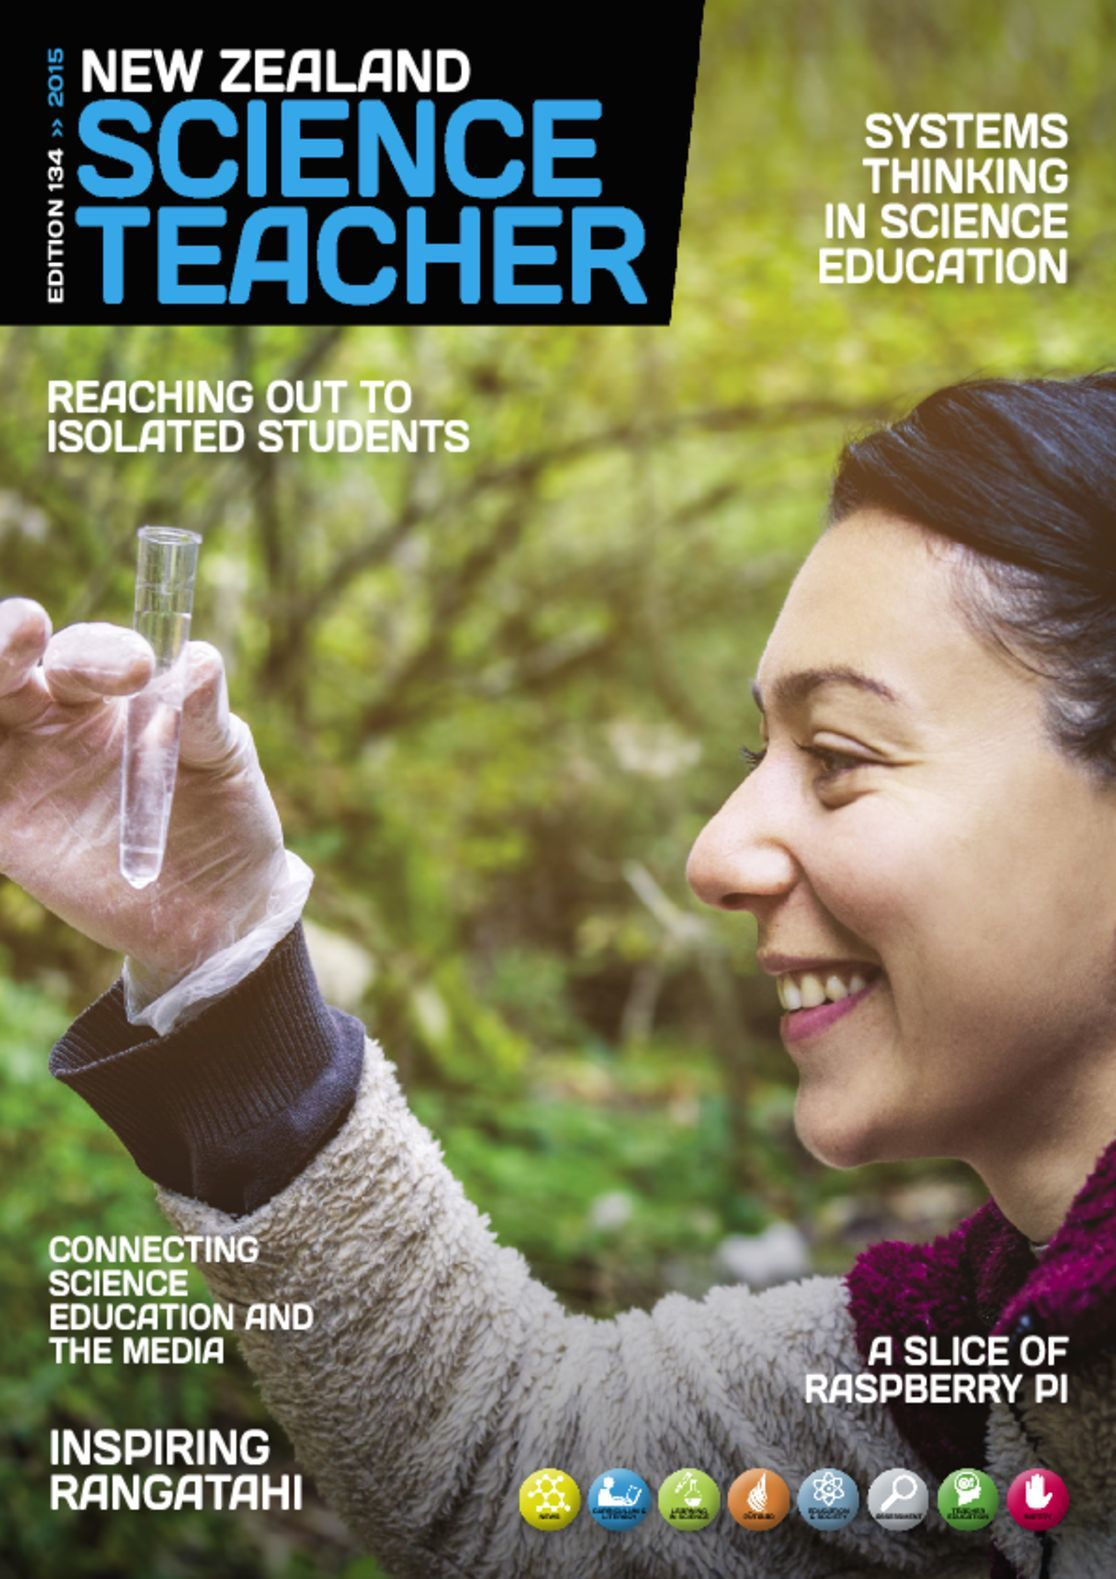 New Zealand Science Teacher Digital